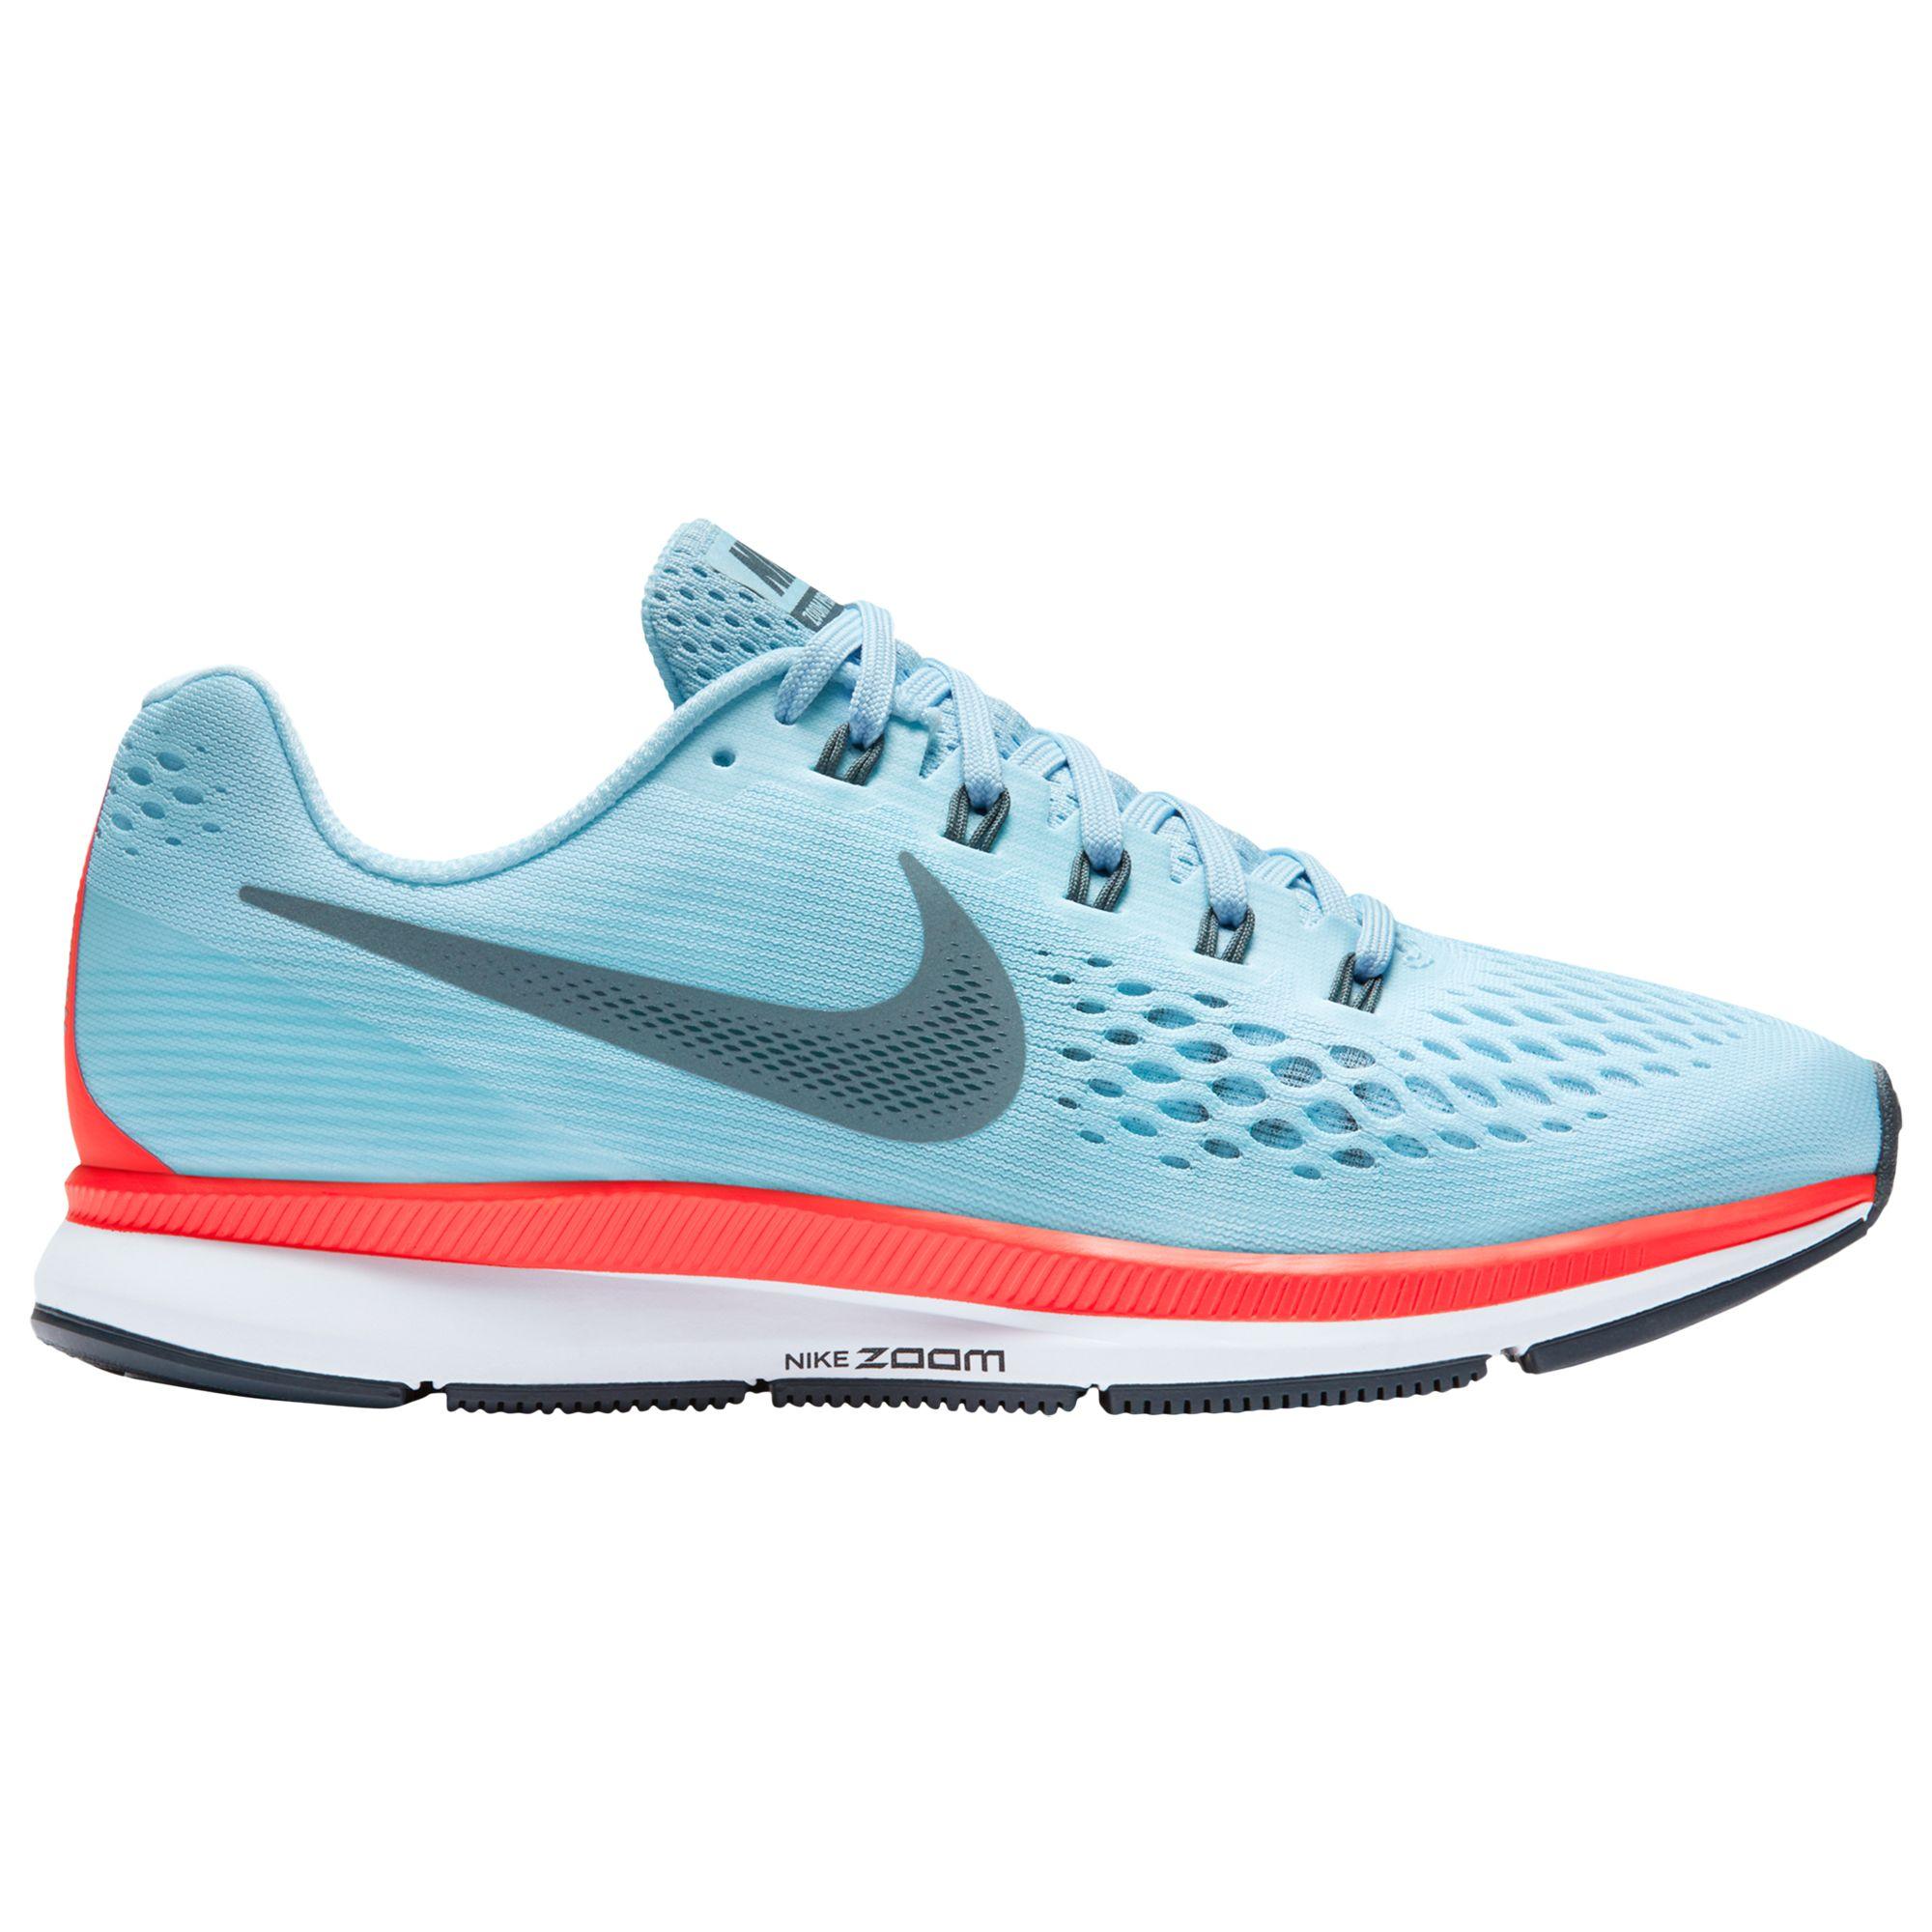 3ad348e00c80f Nike Air Zoom Pegasus 34 Women s Running Shoes